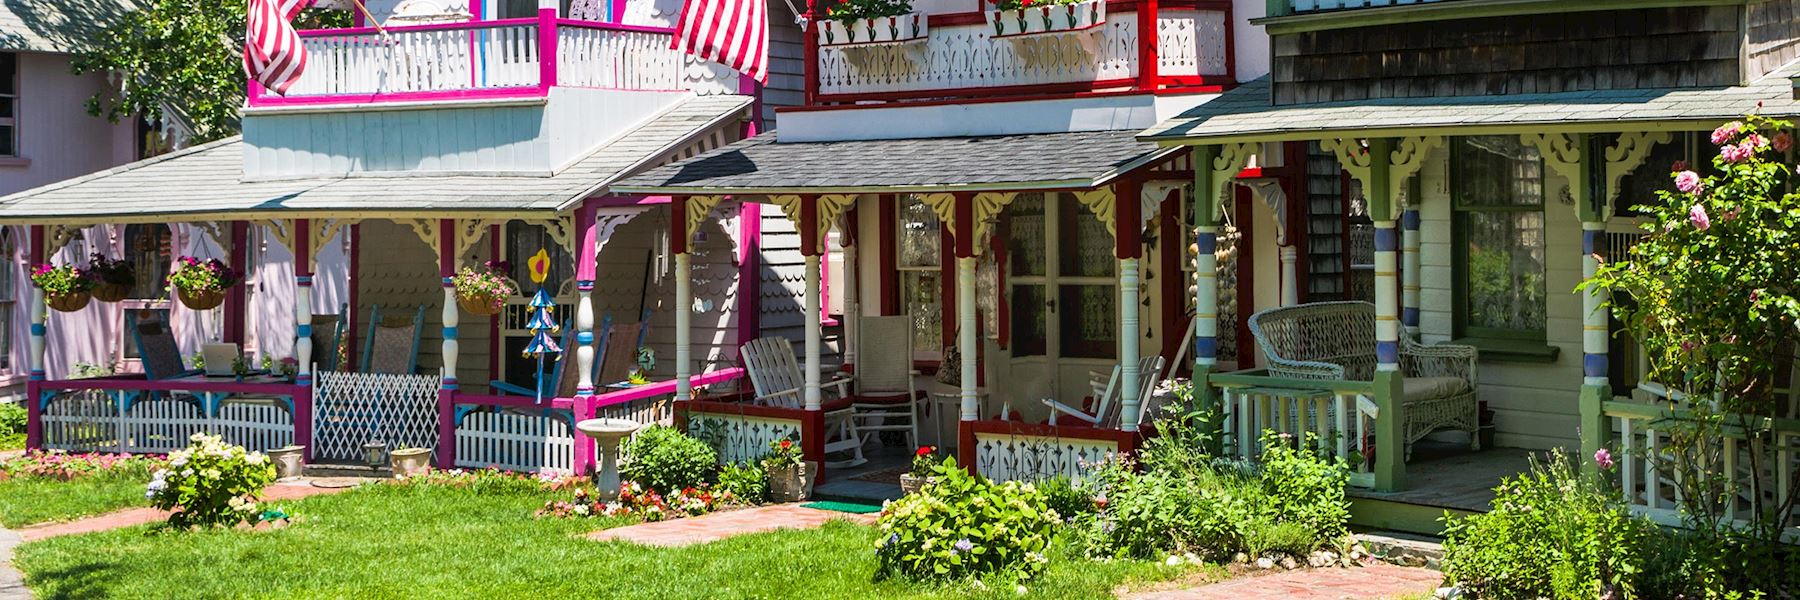 Visit Martha's Vineyard, New England